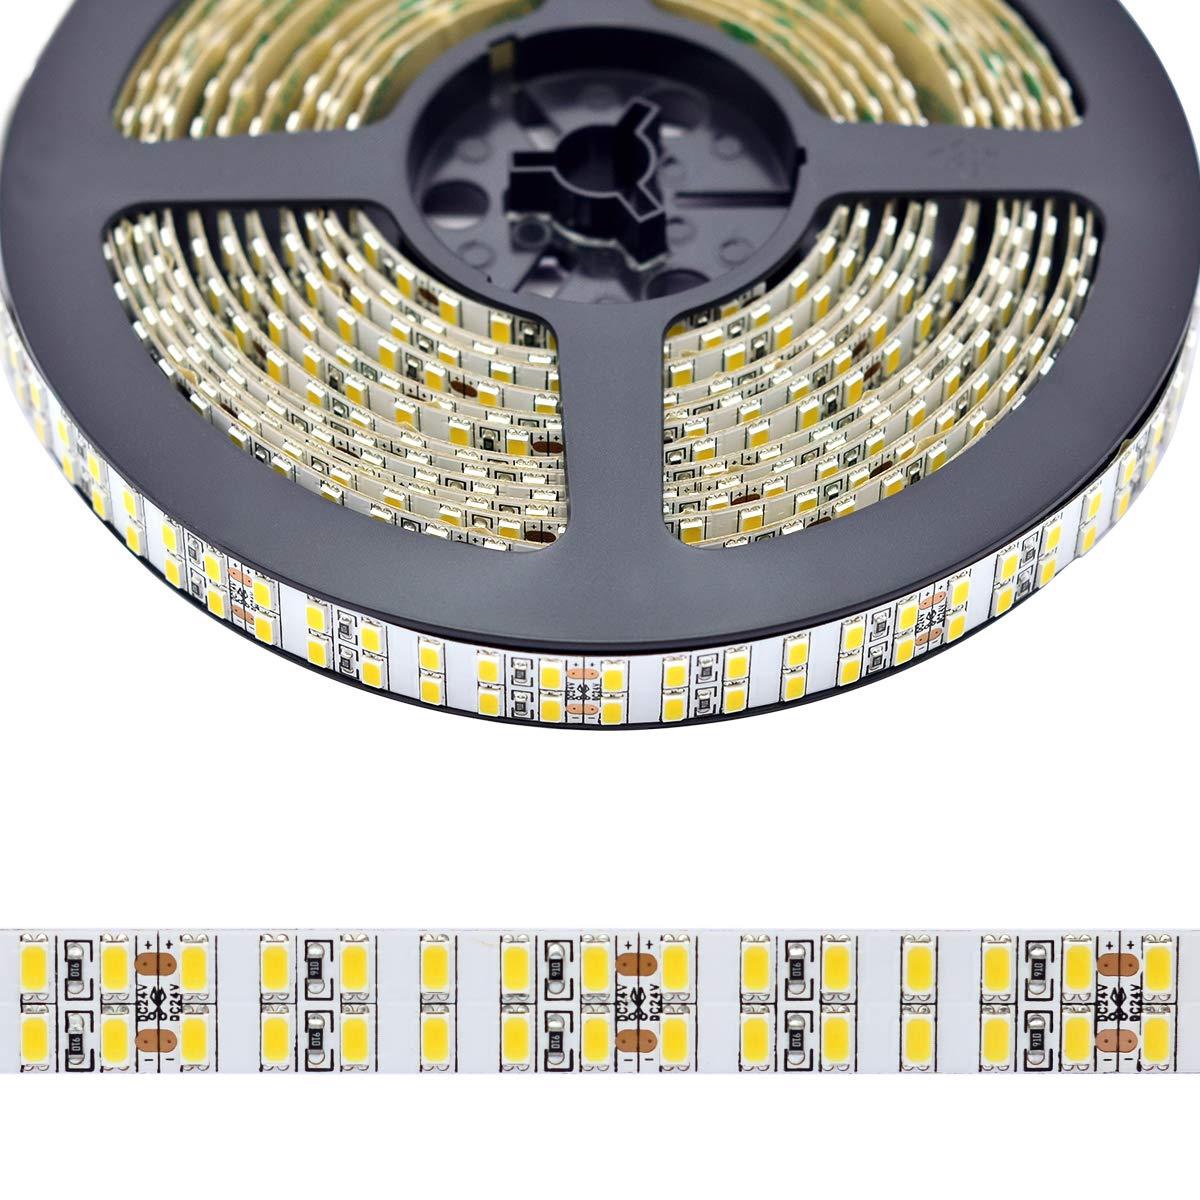 Dual Row Flexible LED Strip Lights, CRI 92 DC24V 5630SMDs 1200 LEDs 5M/16.4Ft Super Bright LED Tape Lighting, Daylight White 6000K Brighter Than Quad Row LED Light Strips